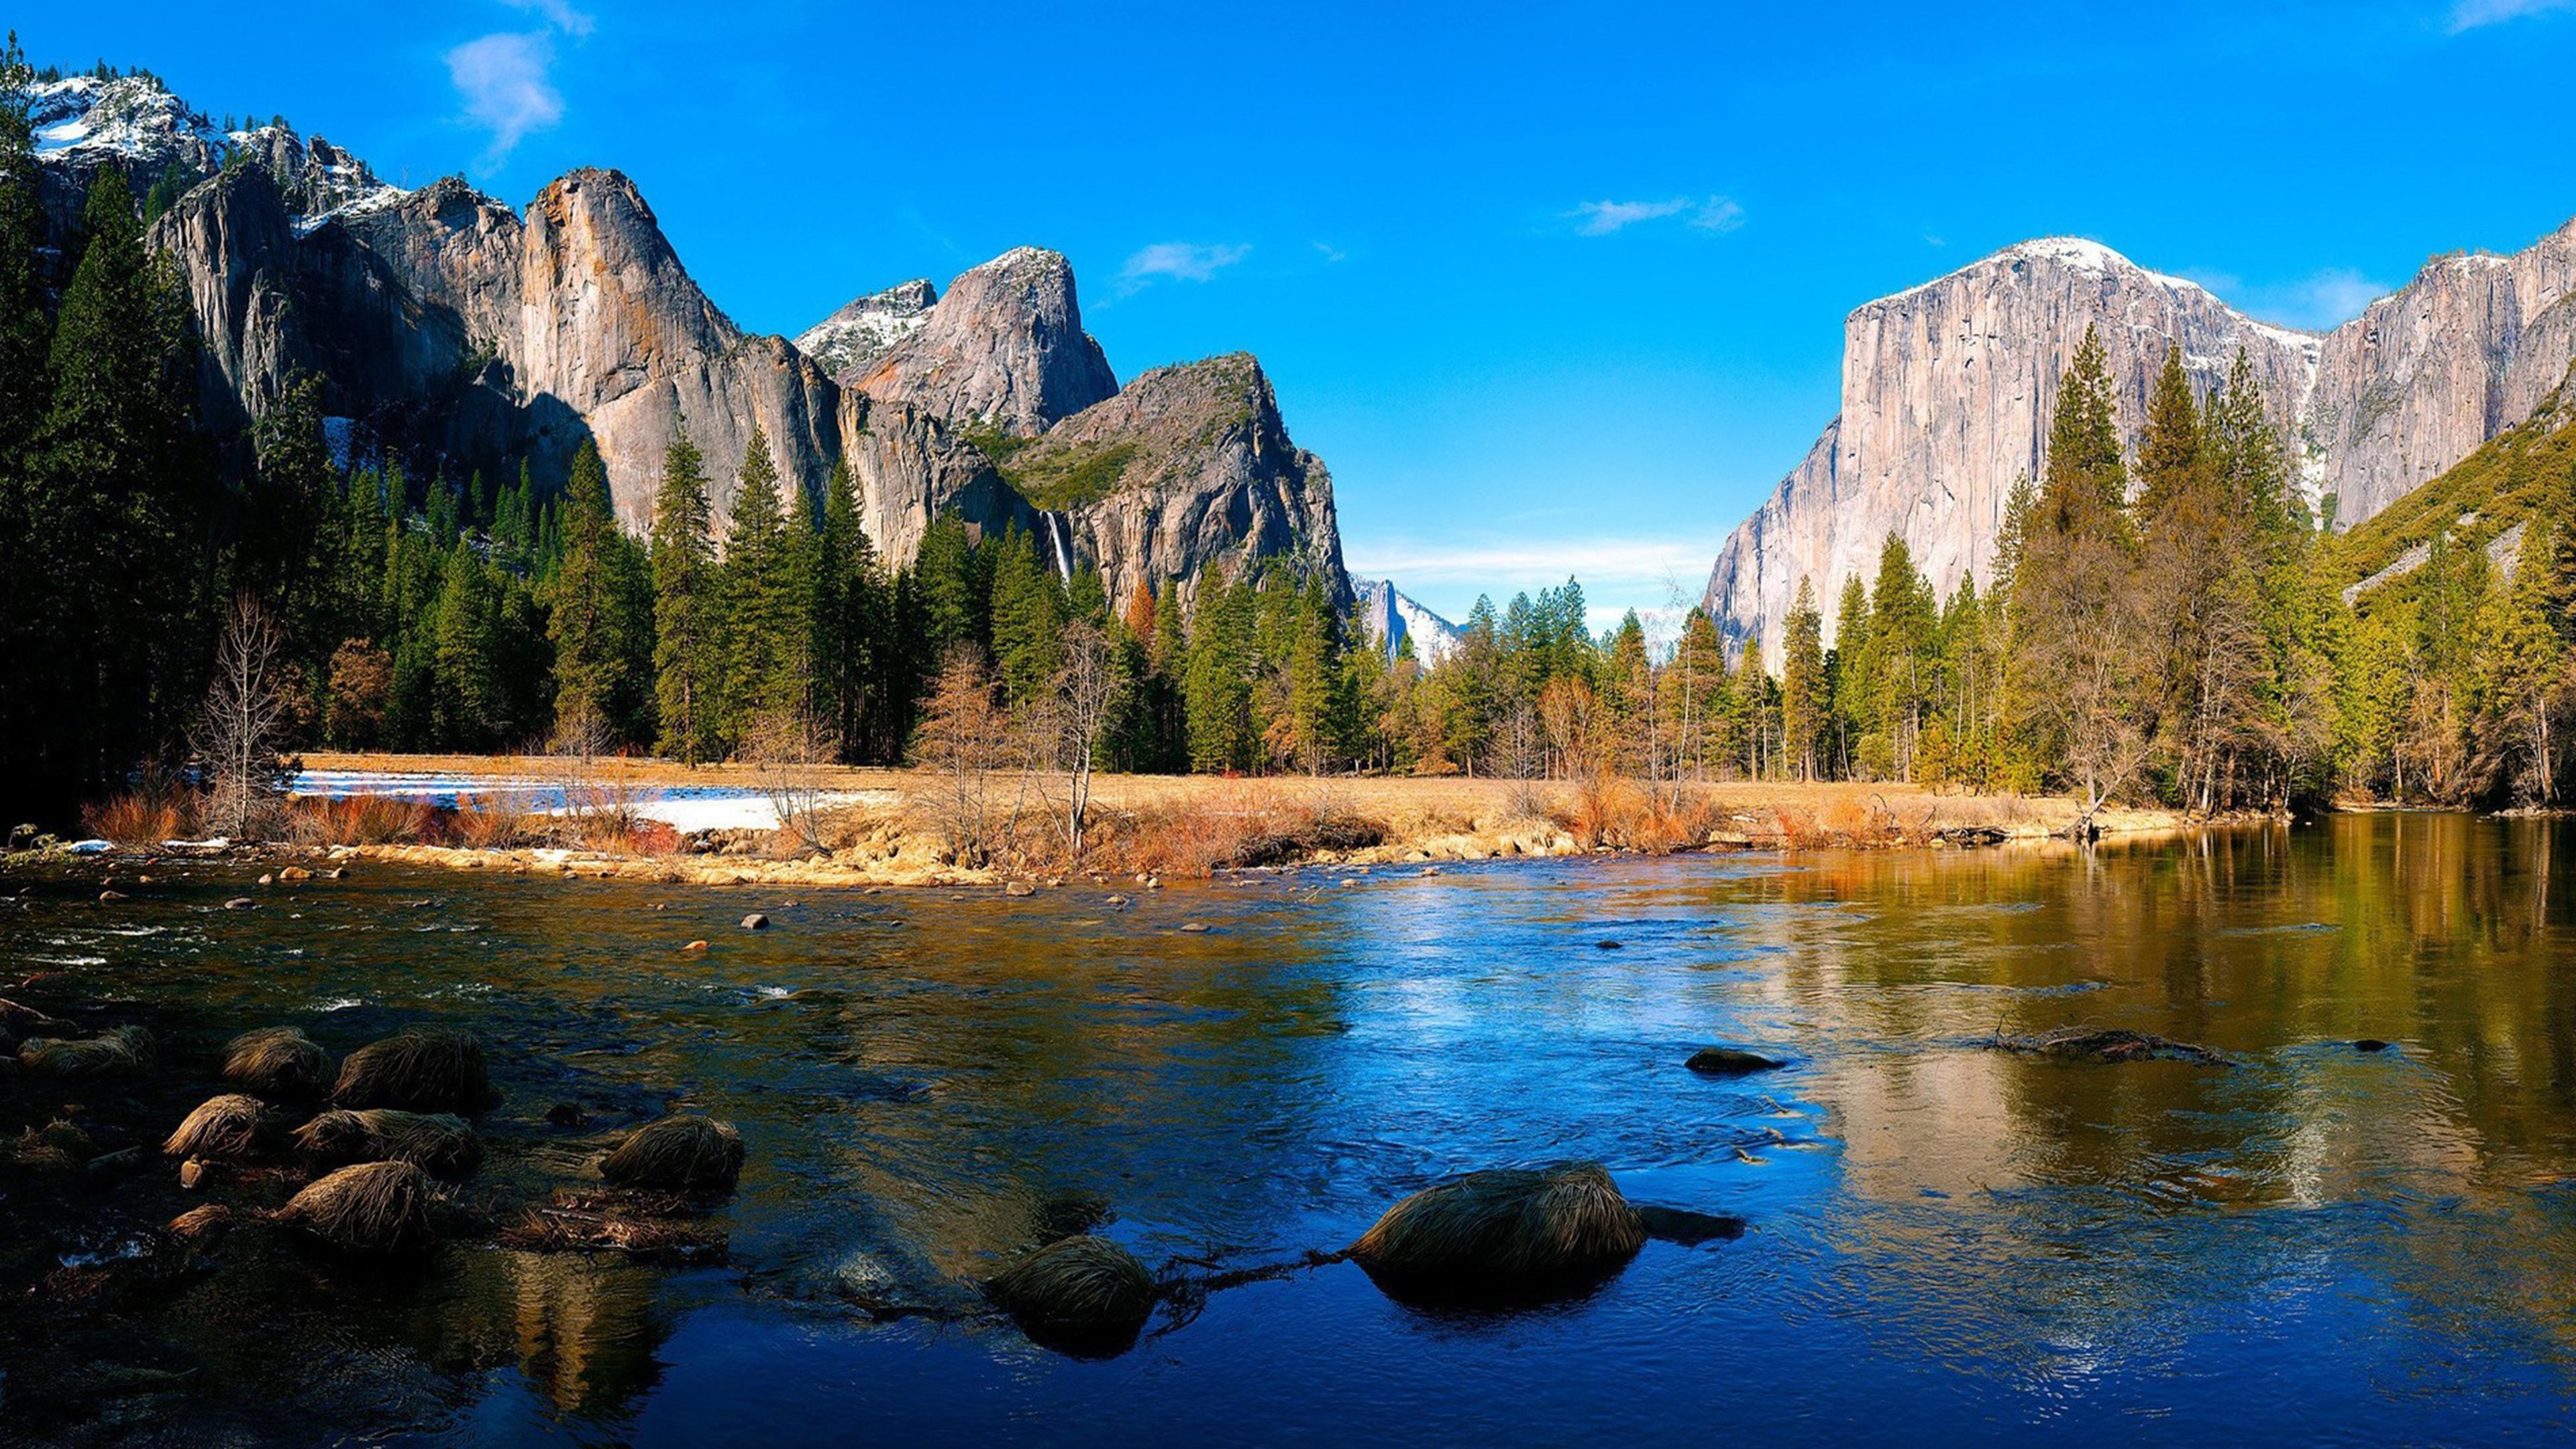 Iphone 4s Hd Wallpapers 1080p Yosemite Ulusal Parkı Ultra Hd 4k Manzara Resimleri Rooteto